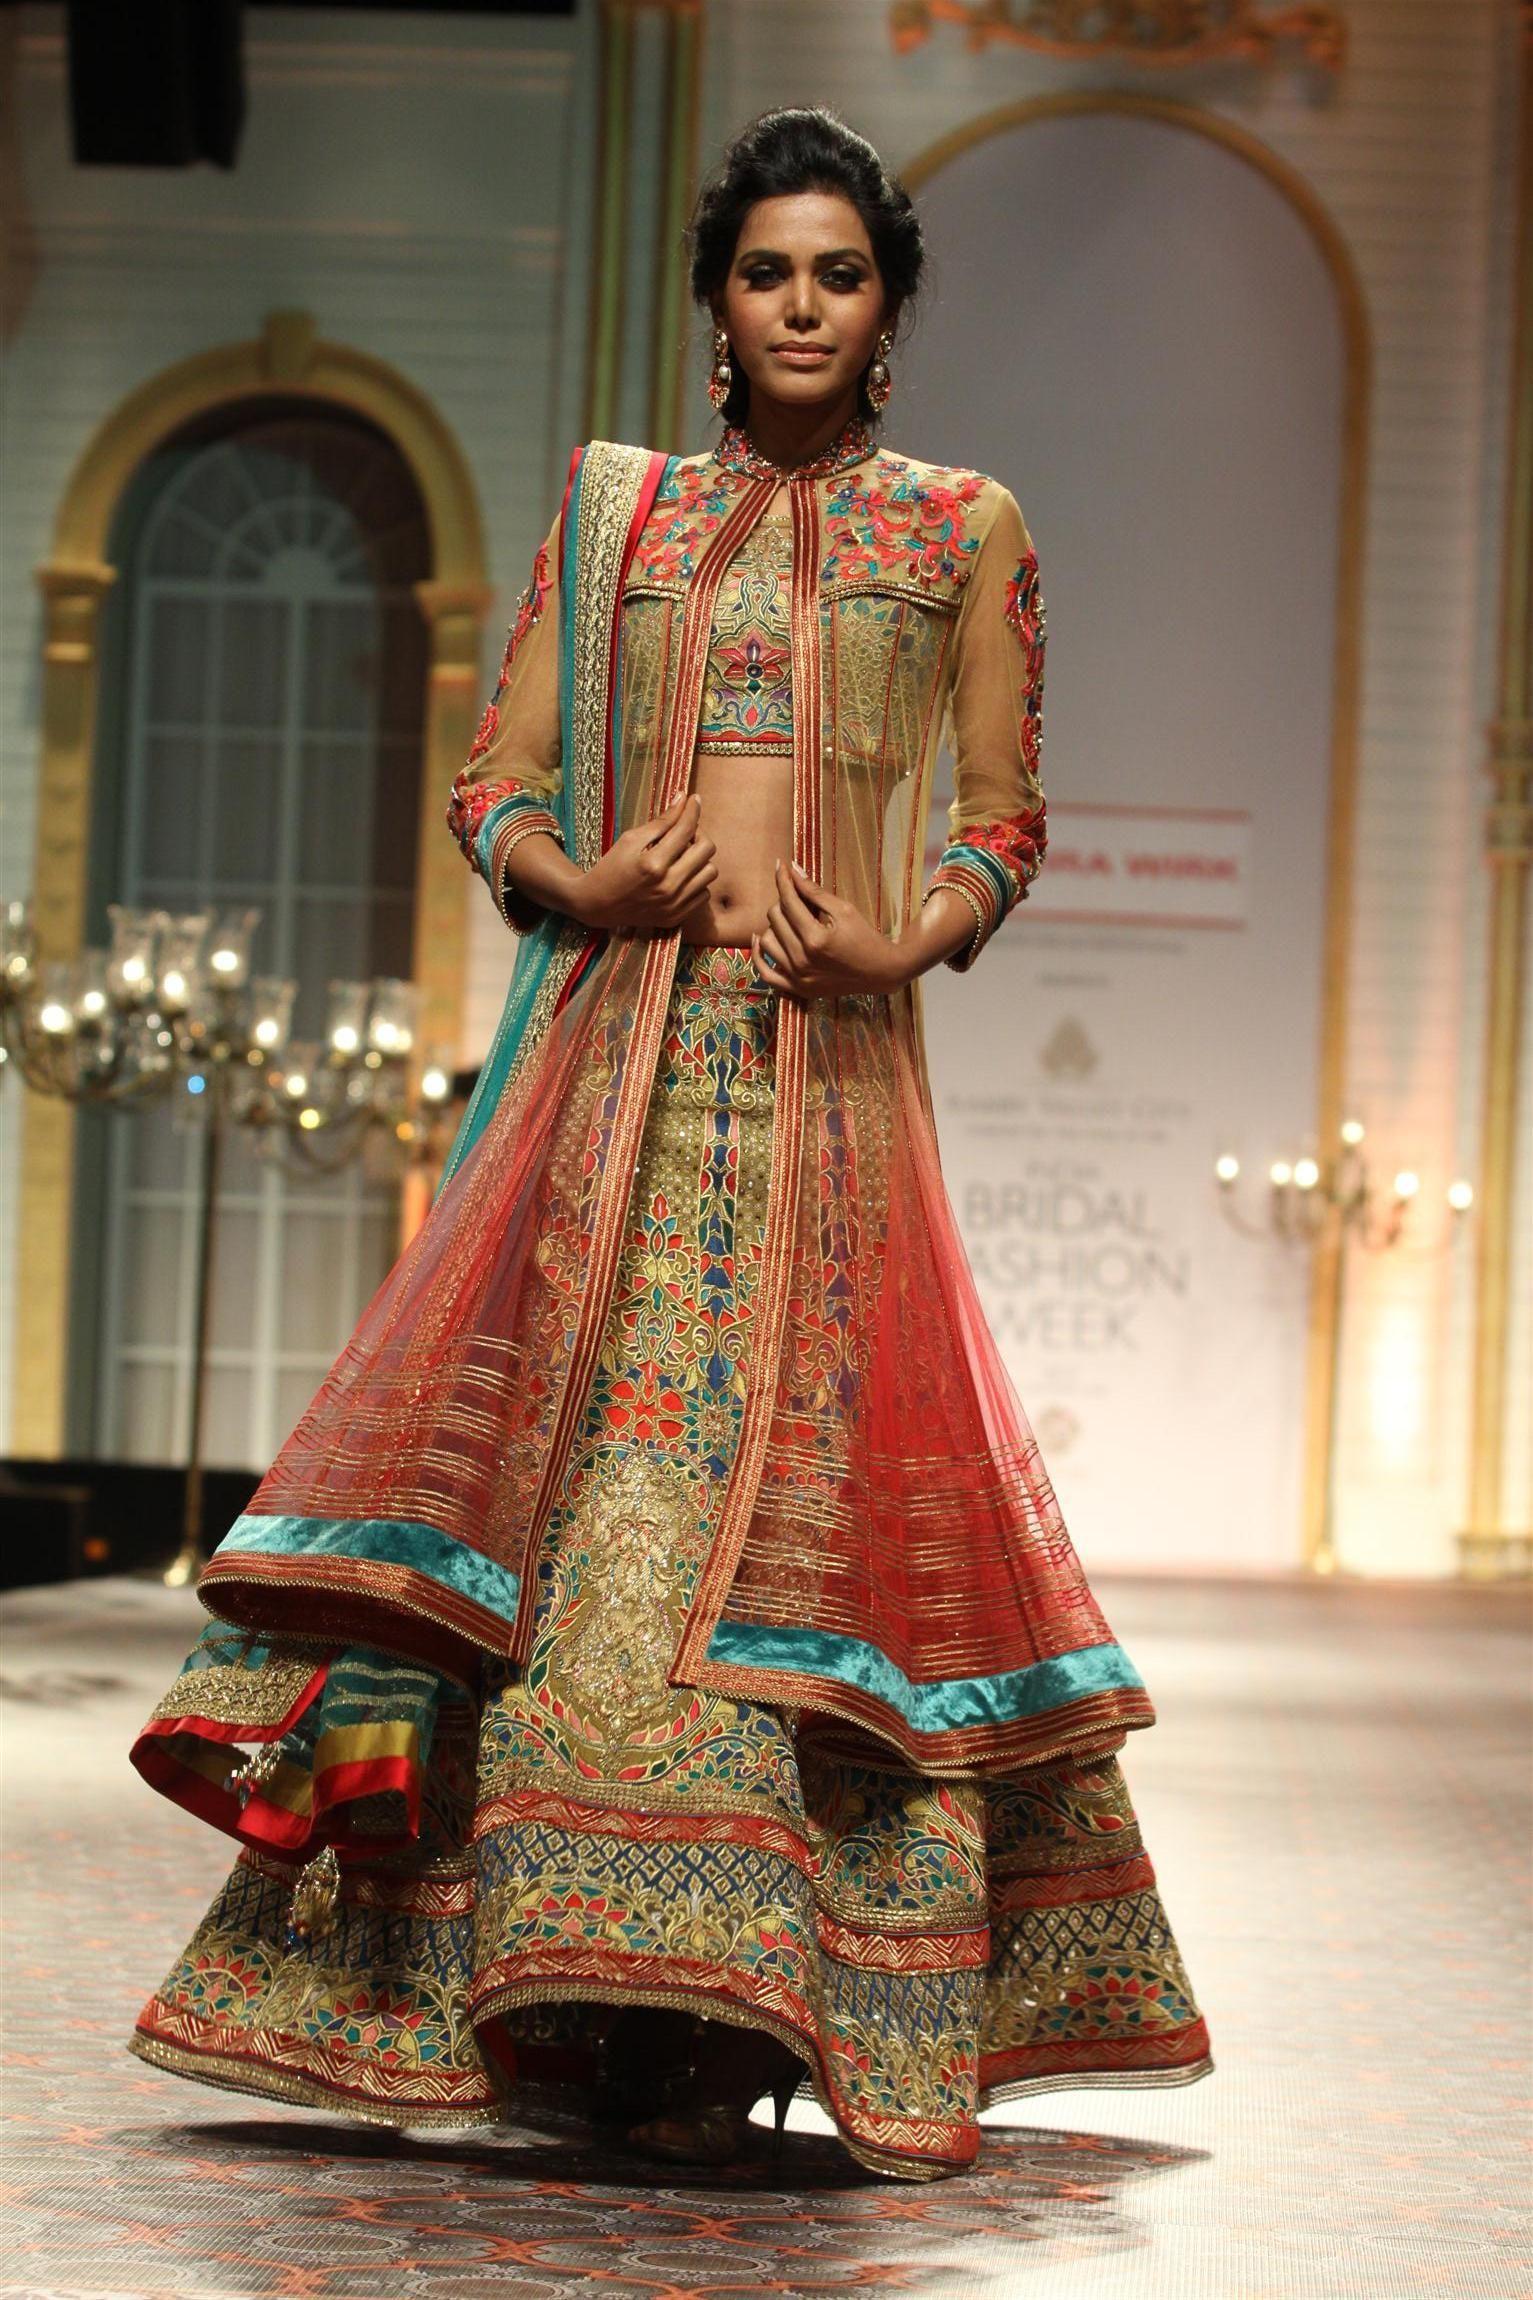 intricately embroidered wedding #lehenga design from Mandira Wirk at ...